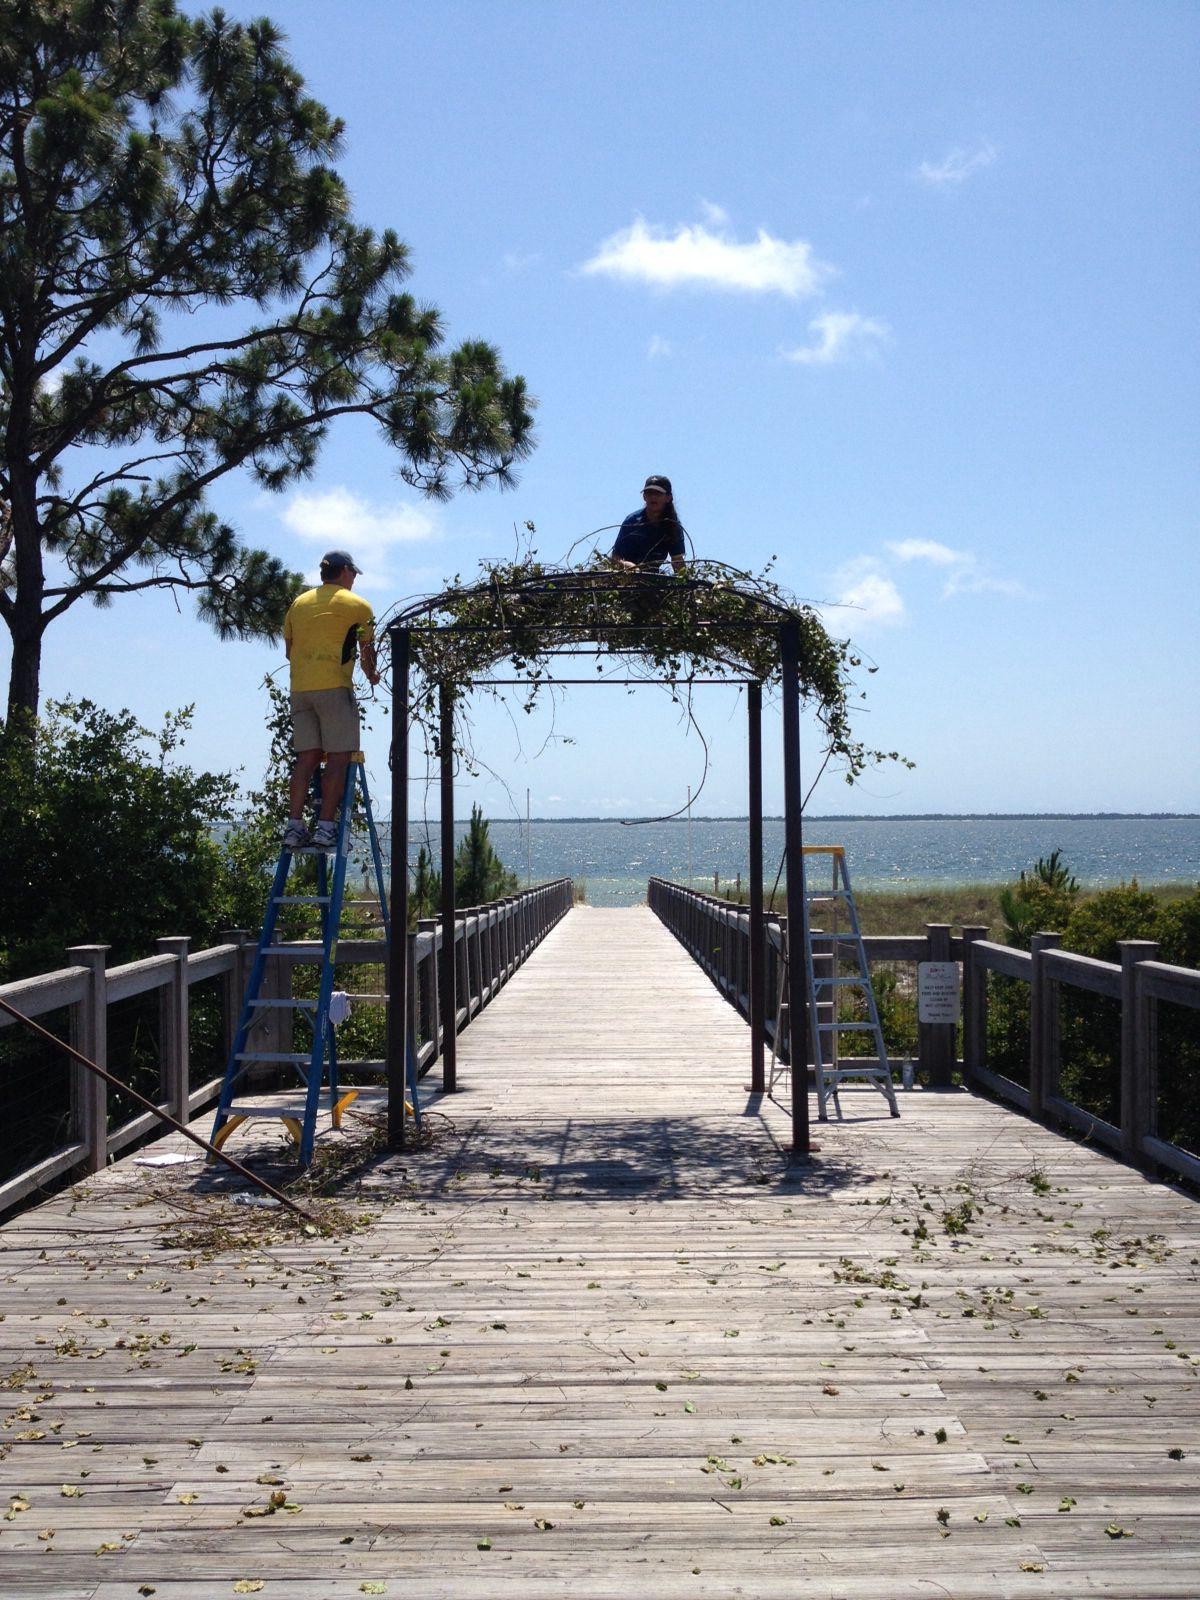 high cotton hard at work while installing ceremony  it looked gorgeous !http://michellecastlephotography.com/blog/rachell-jonathon-port-st-joe-fl-photographers-port-st-joe-fl-weddings-windmark-port-st-joe/